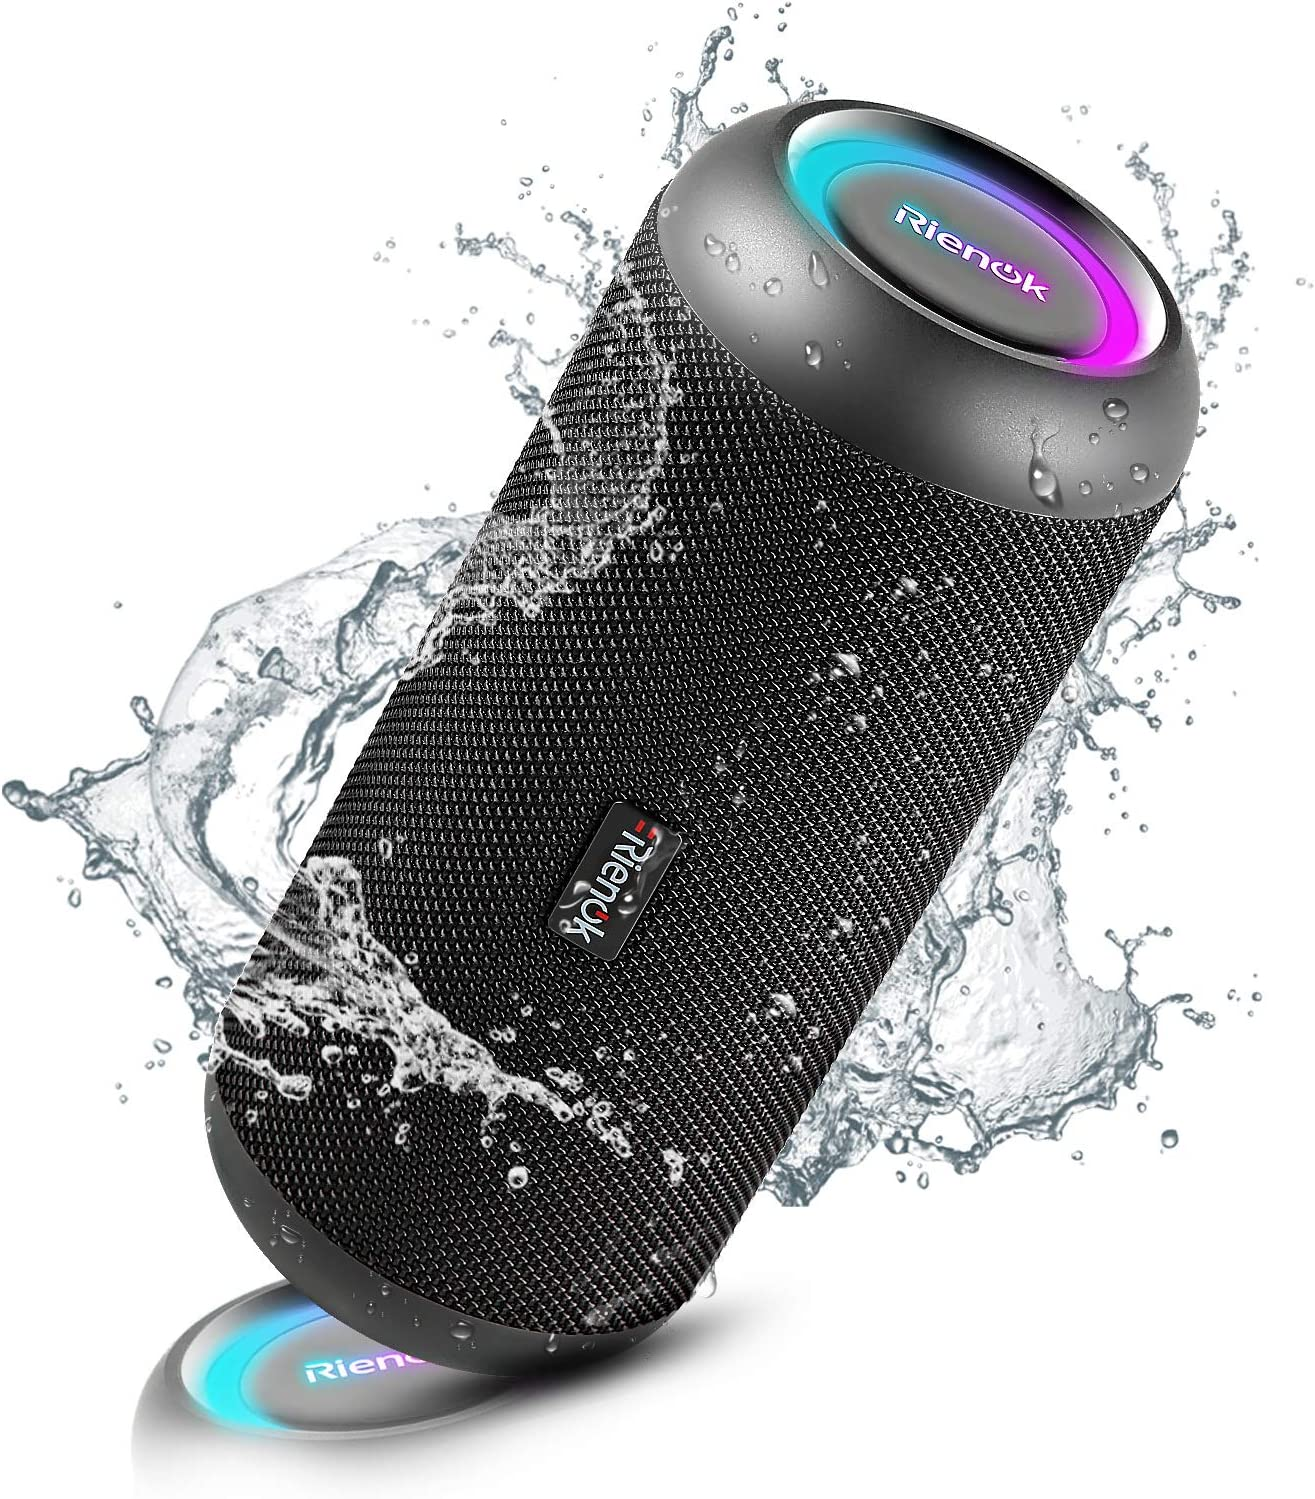 RIENOK Portable Bluetooth Speaker 30W Wireless Speaker TWS Pairing HD Stereo Sound IP67 Waterproof Outdoor Sport Speakers Bluetooth 5.0 for Home Party